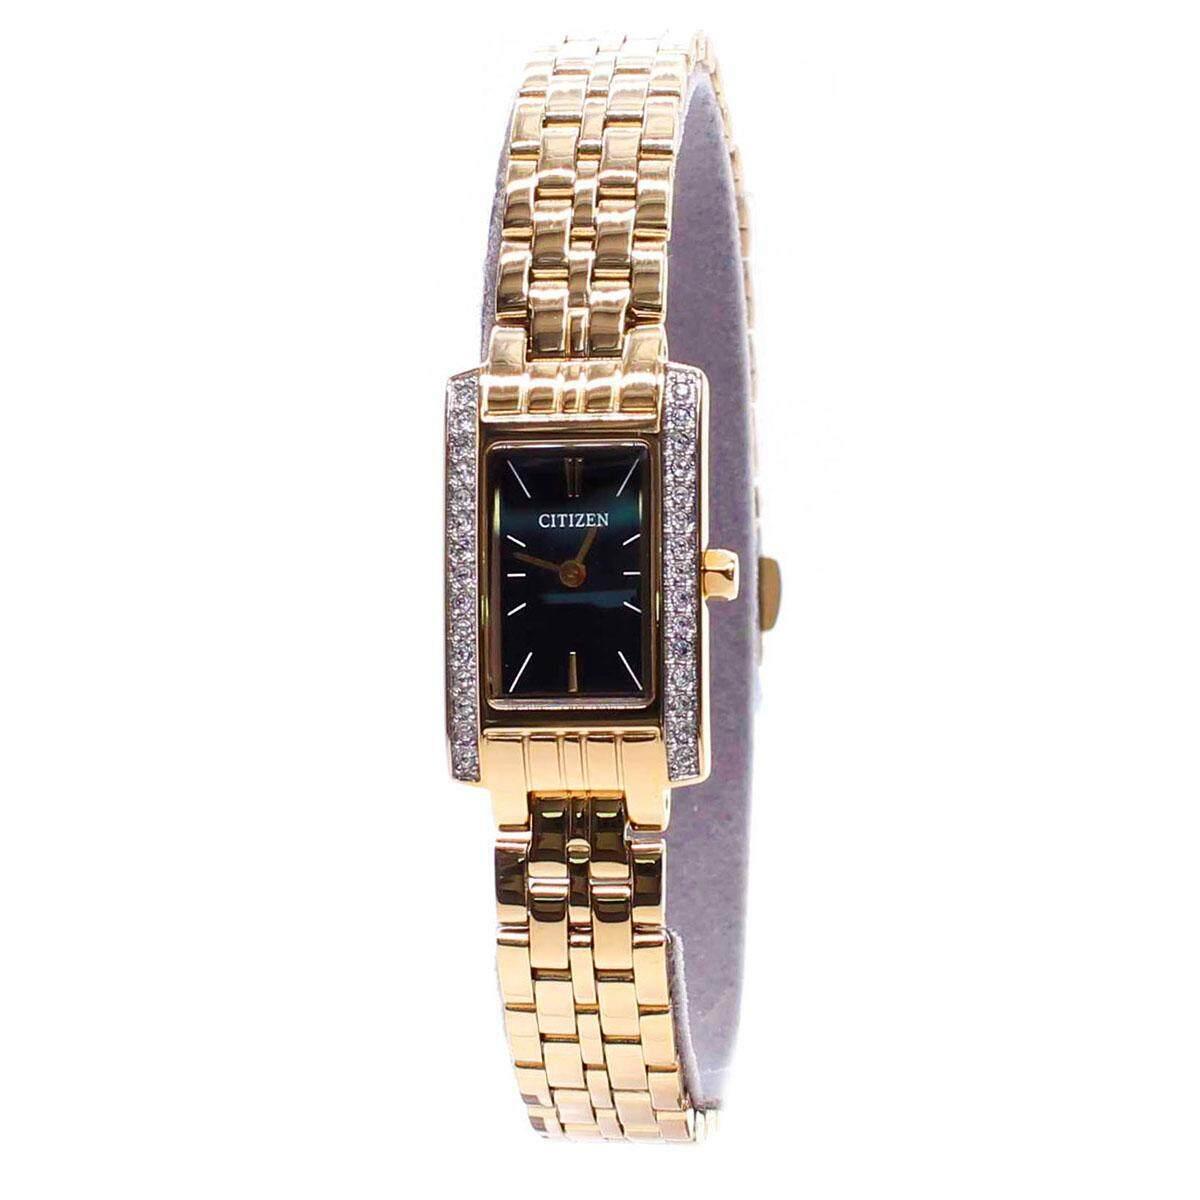 Citizen Citizen Quartz Gold Stainless-Steel Case Stainless-Steel Bracelet Ladies EZ6352-58E Malaysia